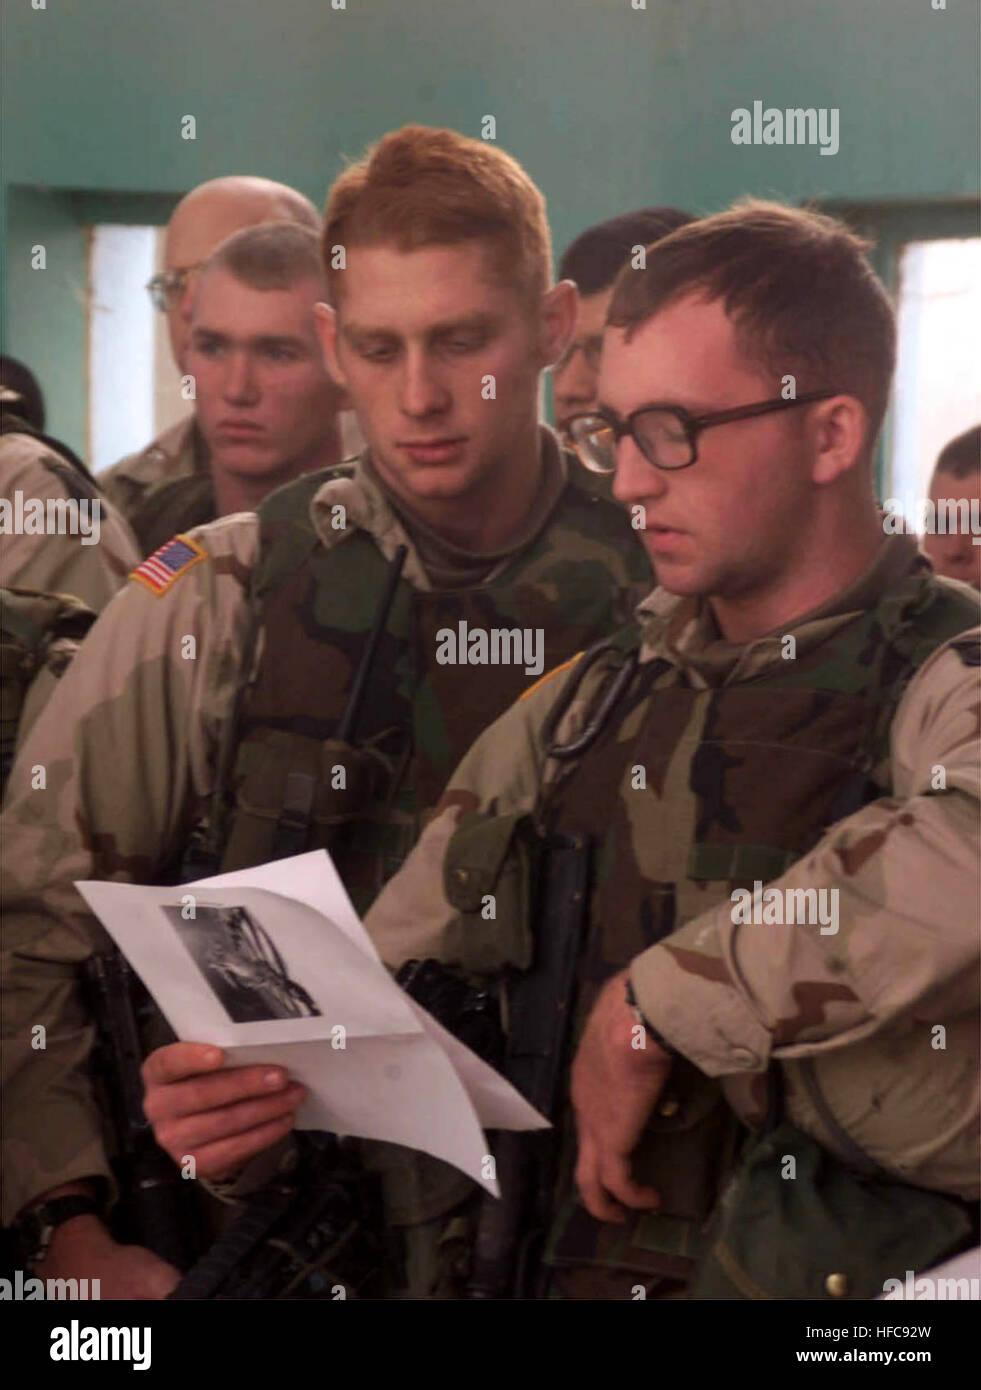 Singing Hymn Marine Stock Photos & Singing Hymn Marine Stock Images